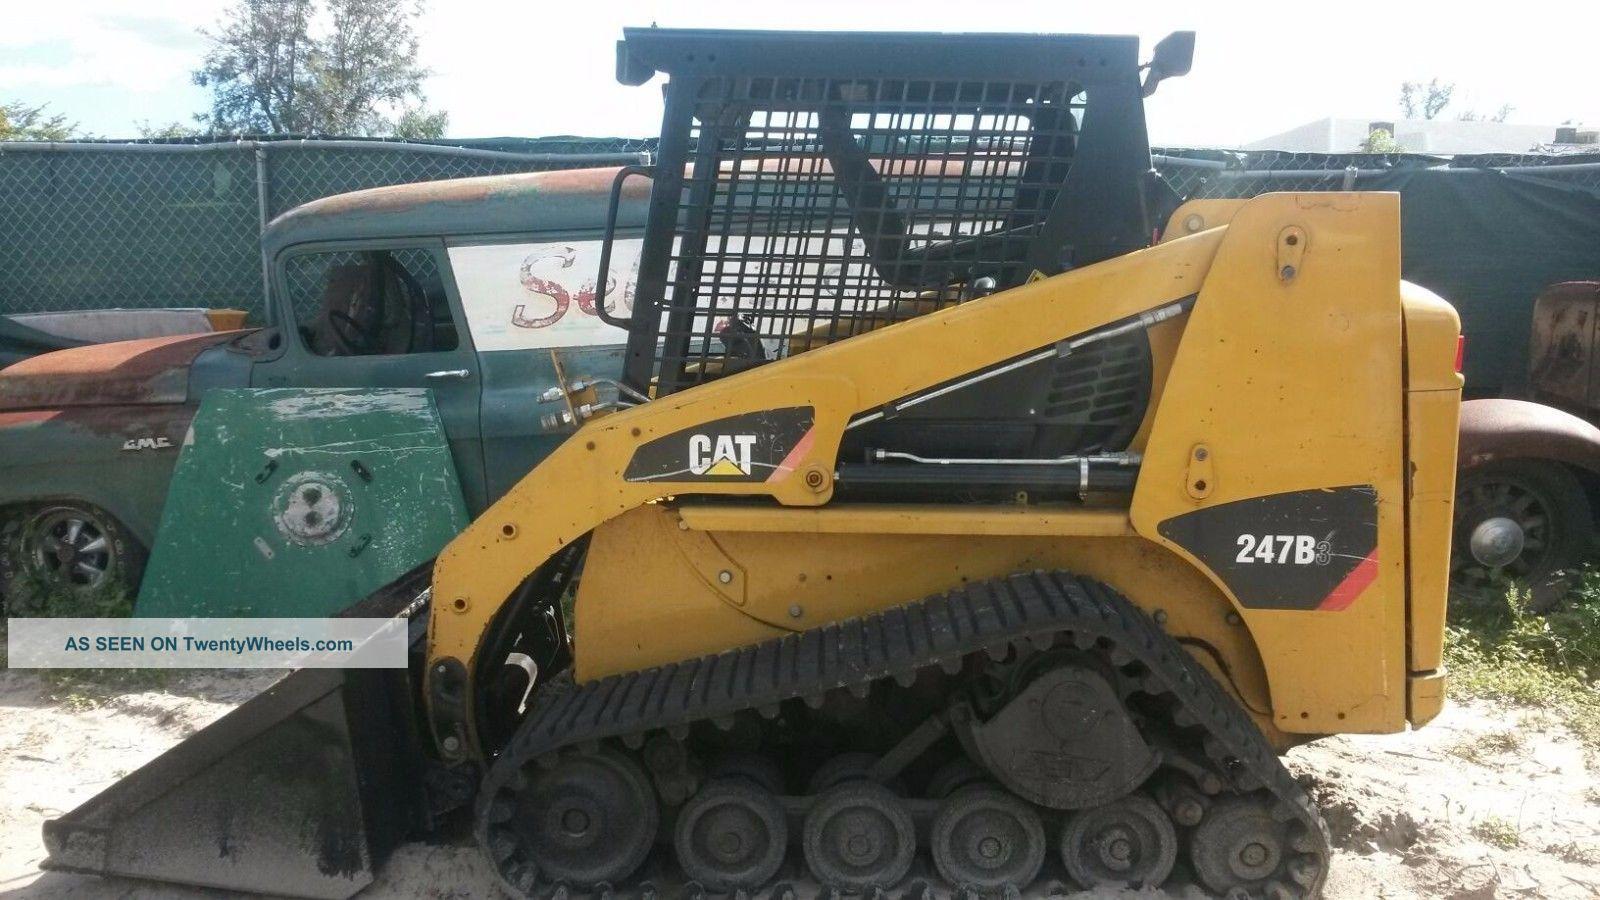 Caterpillar 247b Rubber Track Skid Steer Loader Bobcat Diesel Pilot Controls Crawler Dozers & Loaders photo